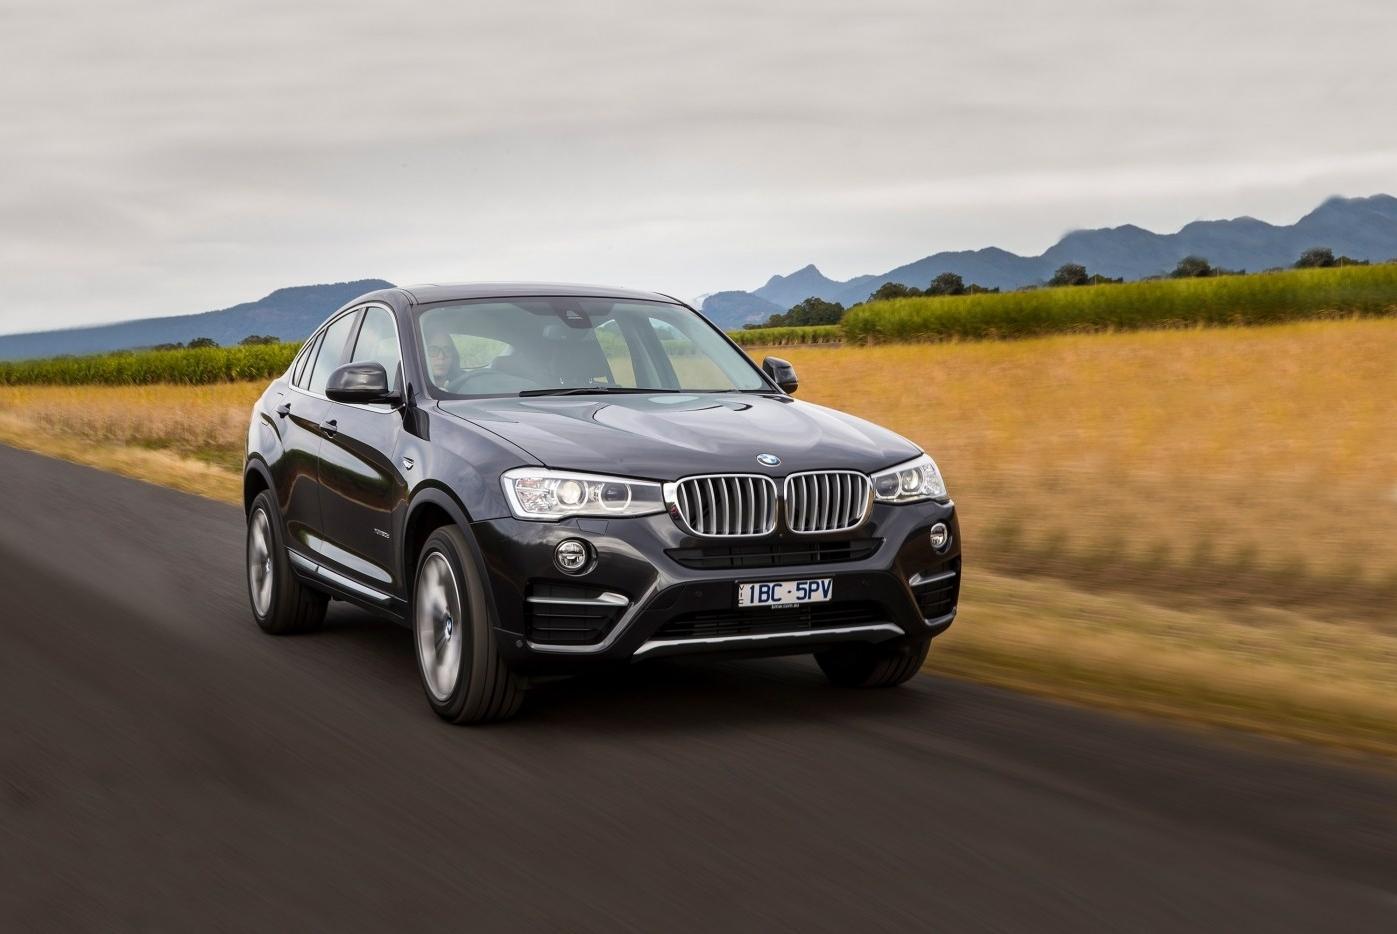 BMW X4 (F26) - цены, отзывы, характеристики X4 (F26) от BMW